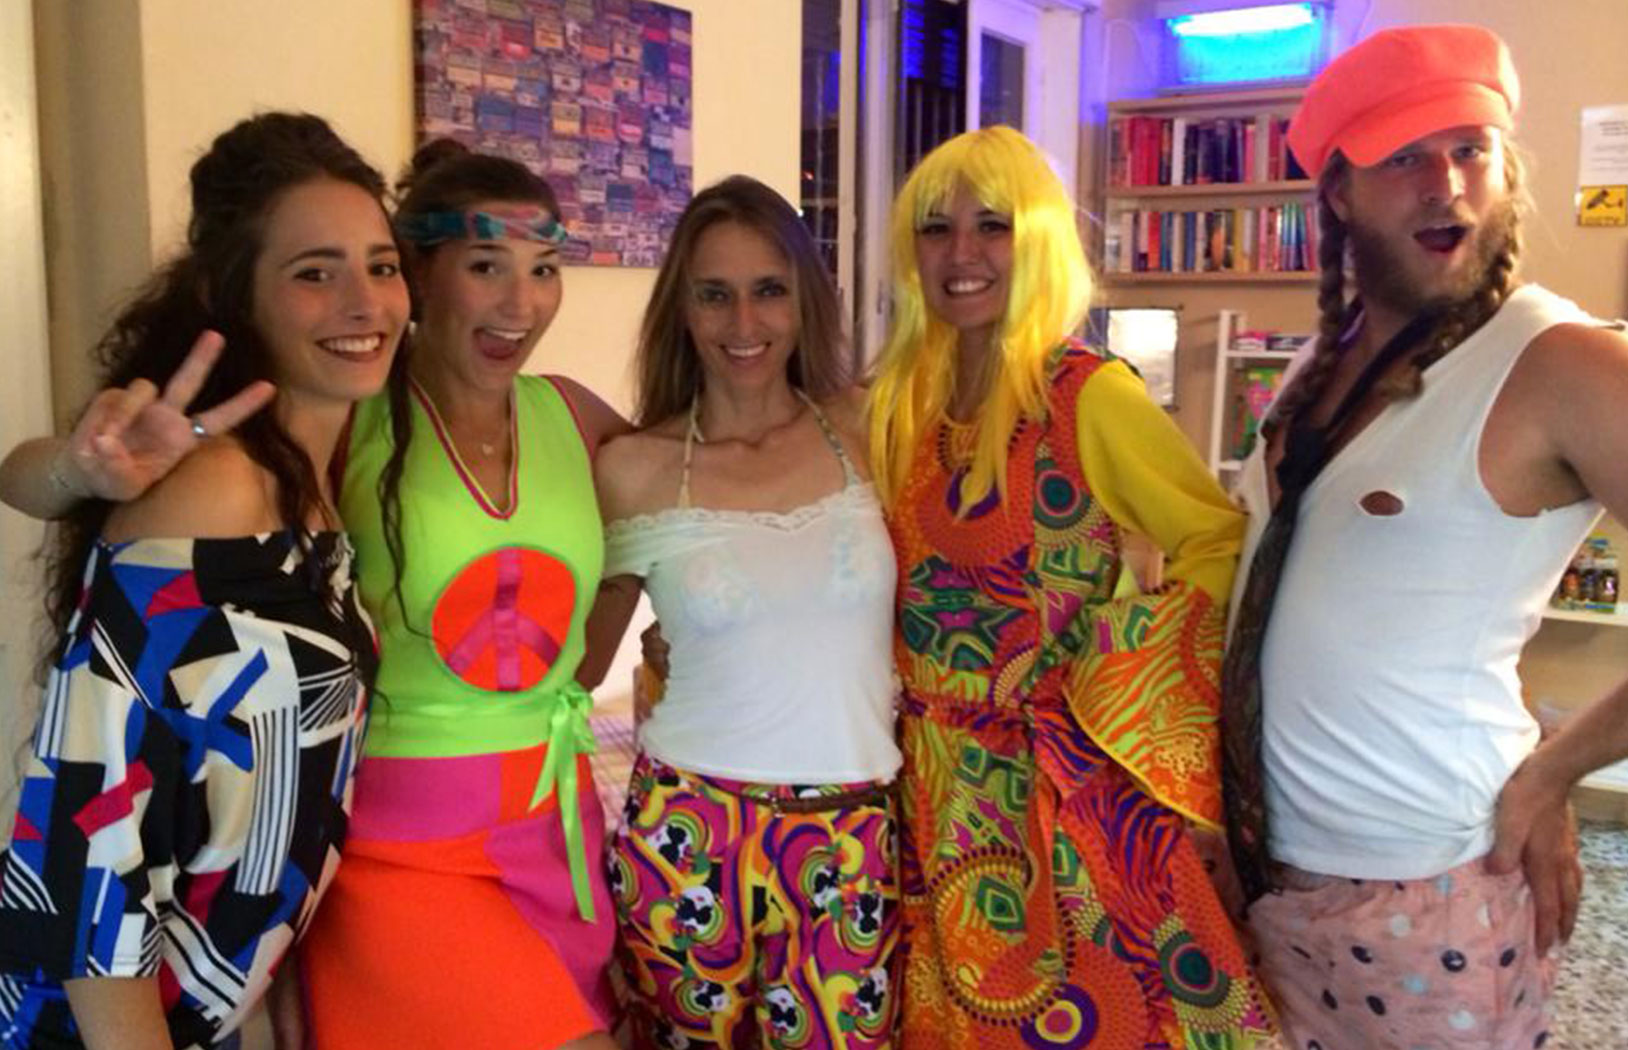 Tolle Partys am Lago Maggiore-feiern